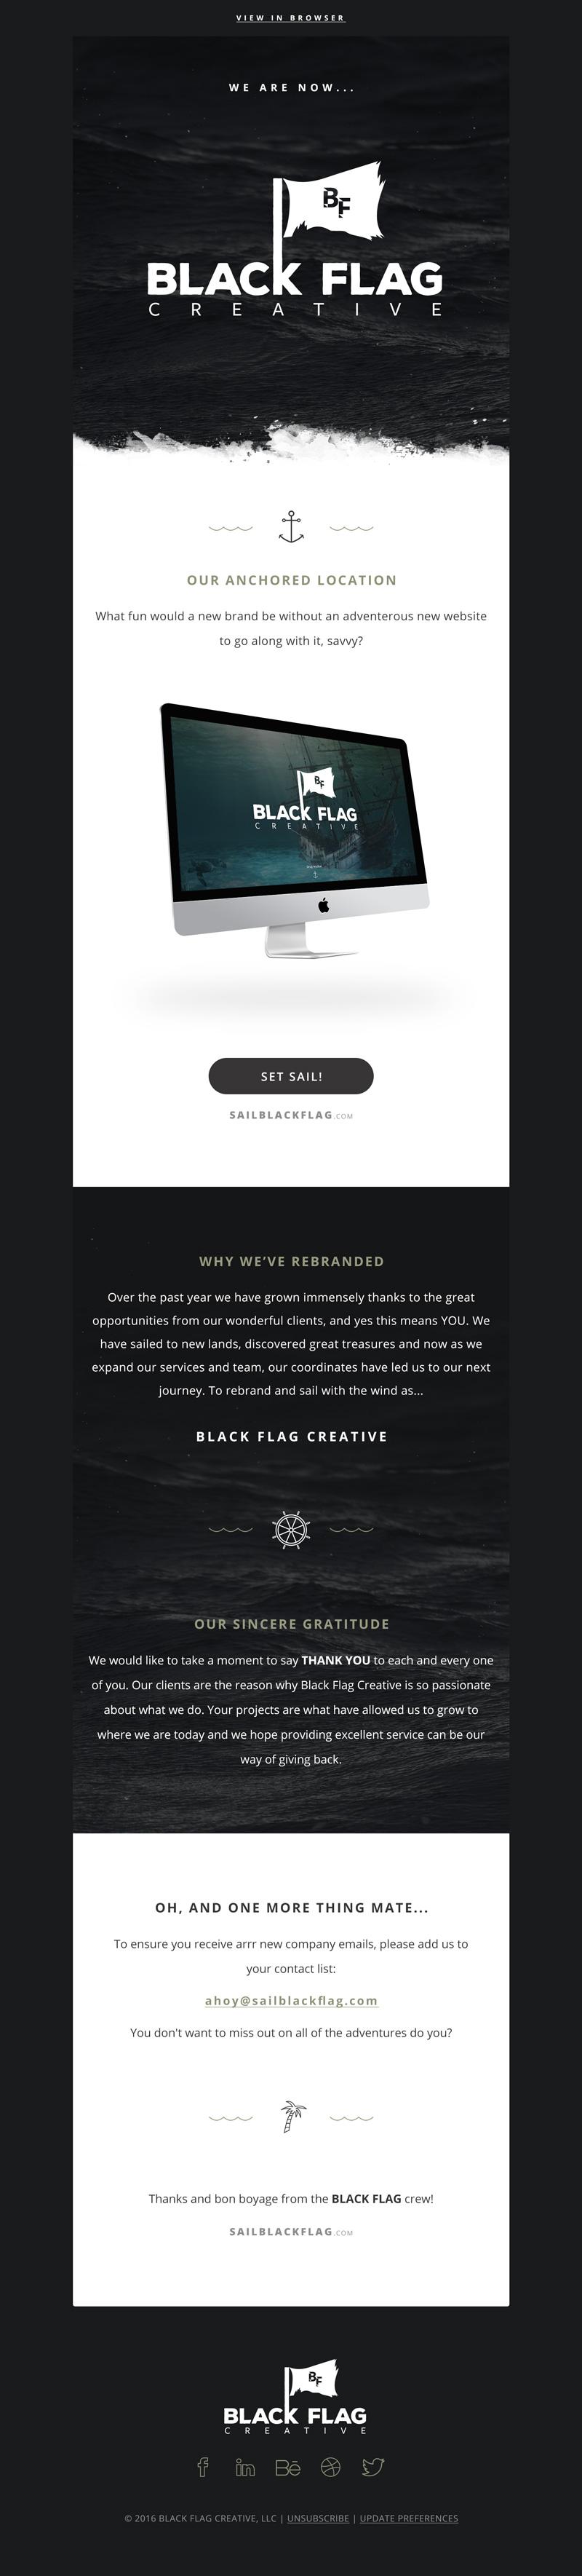 Blackflagcreative promocampaign full